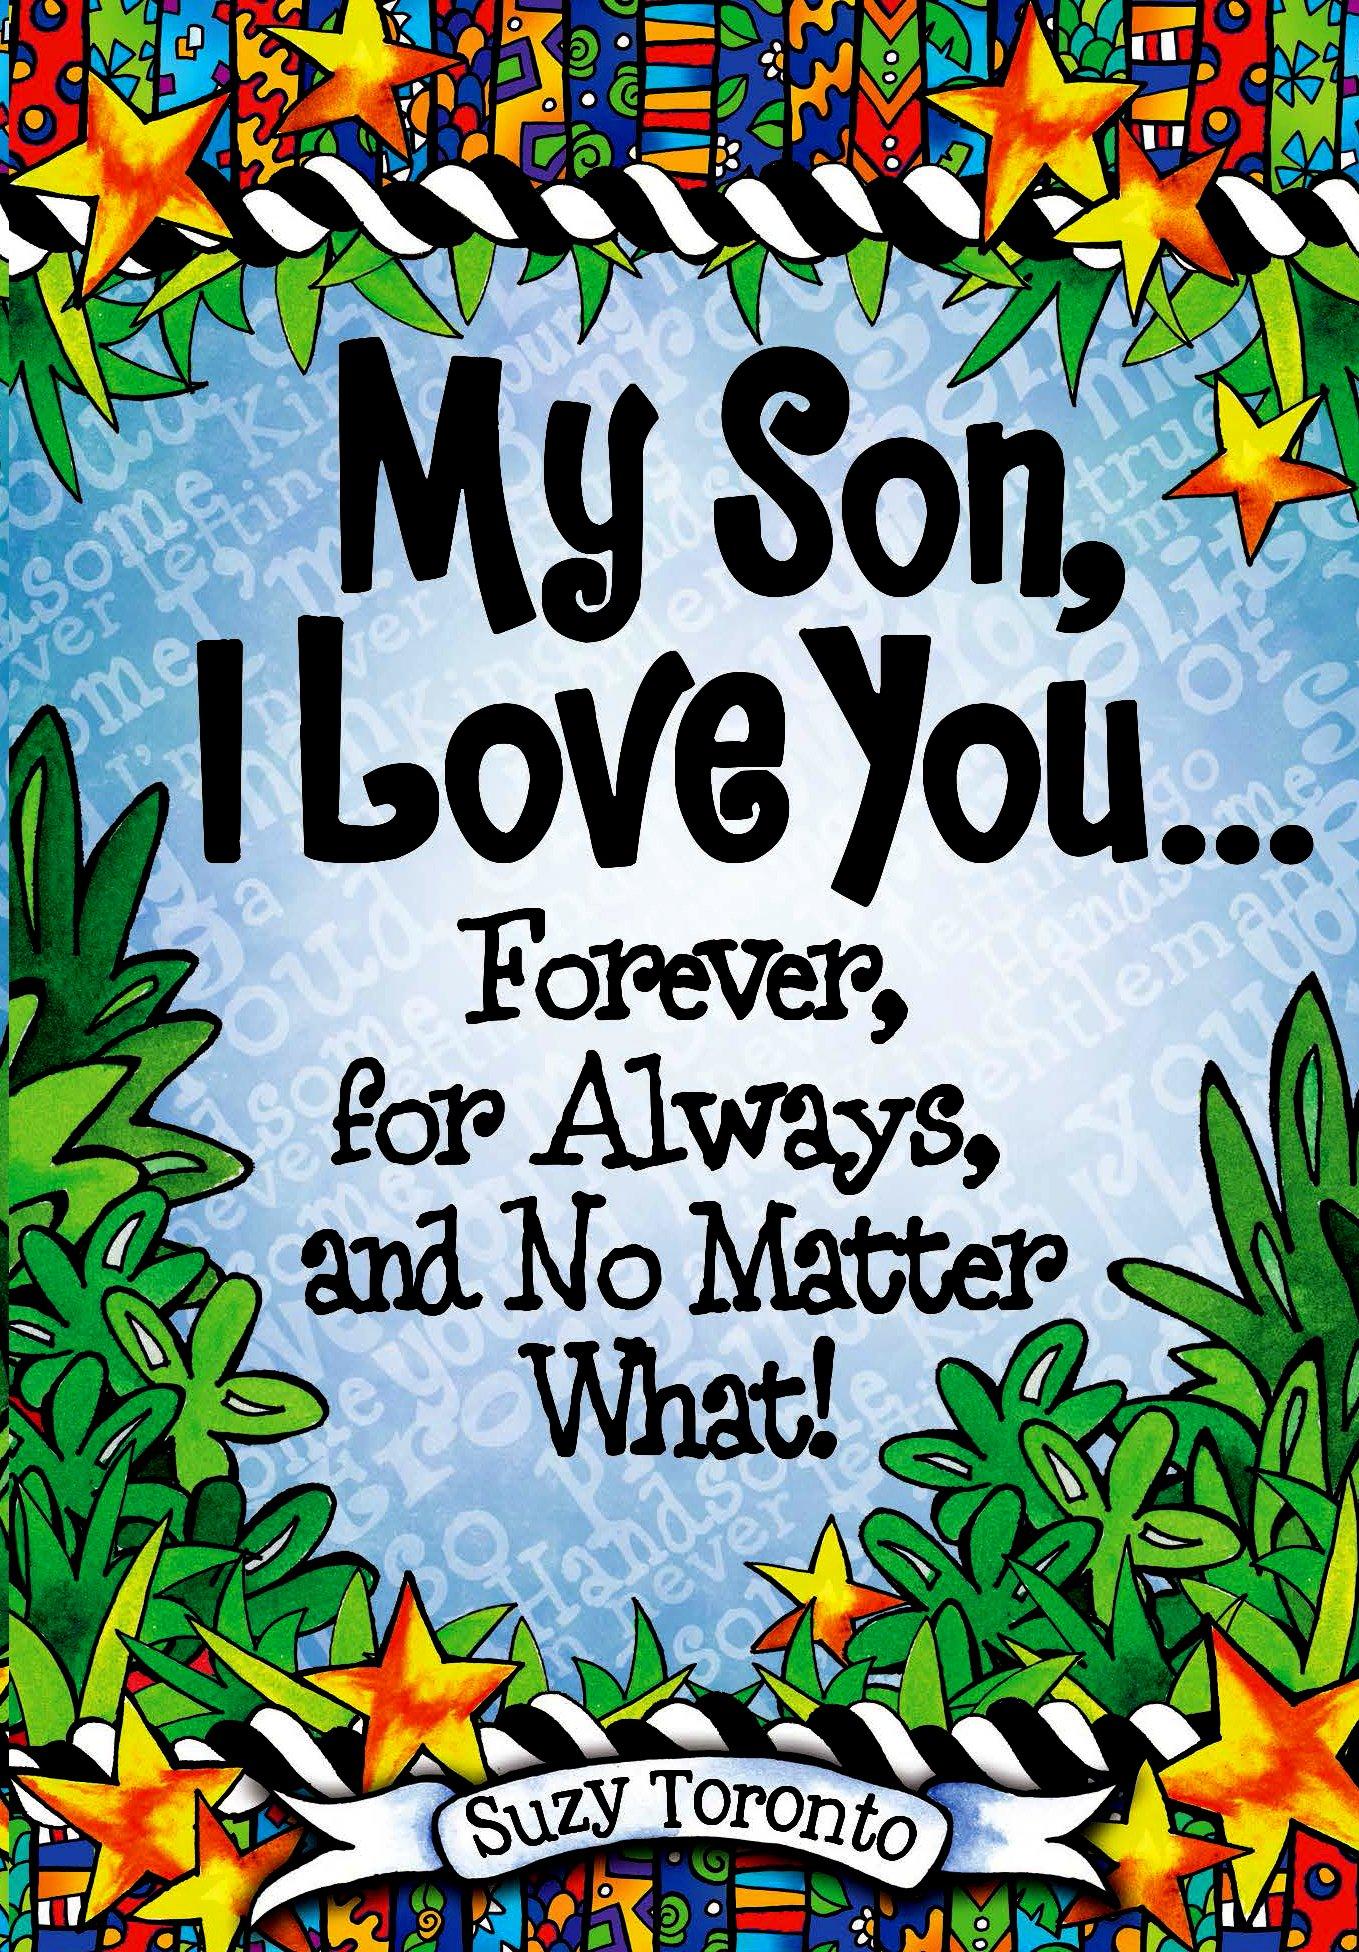 The love son